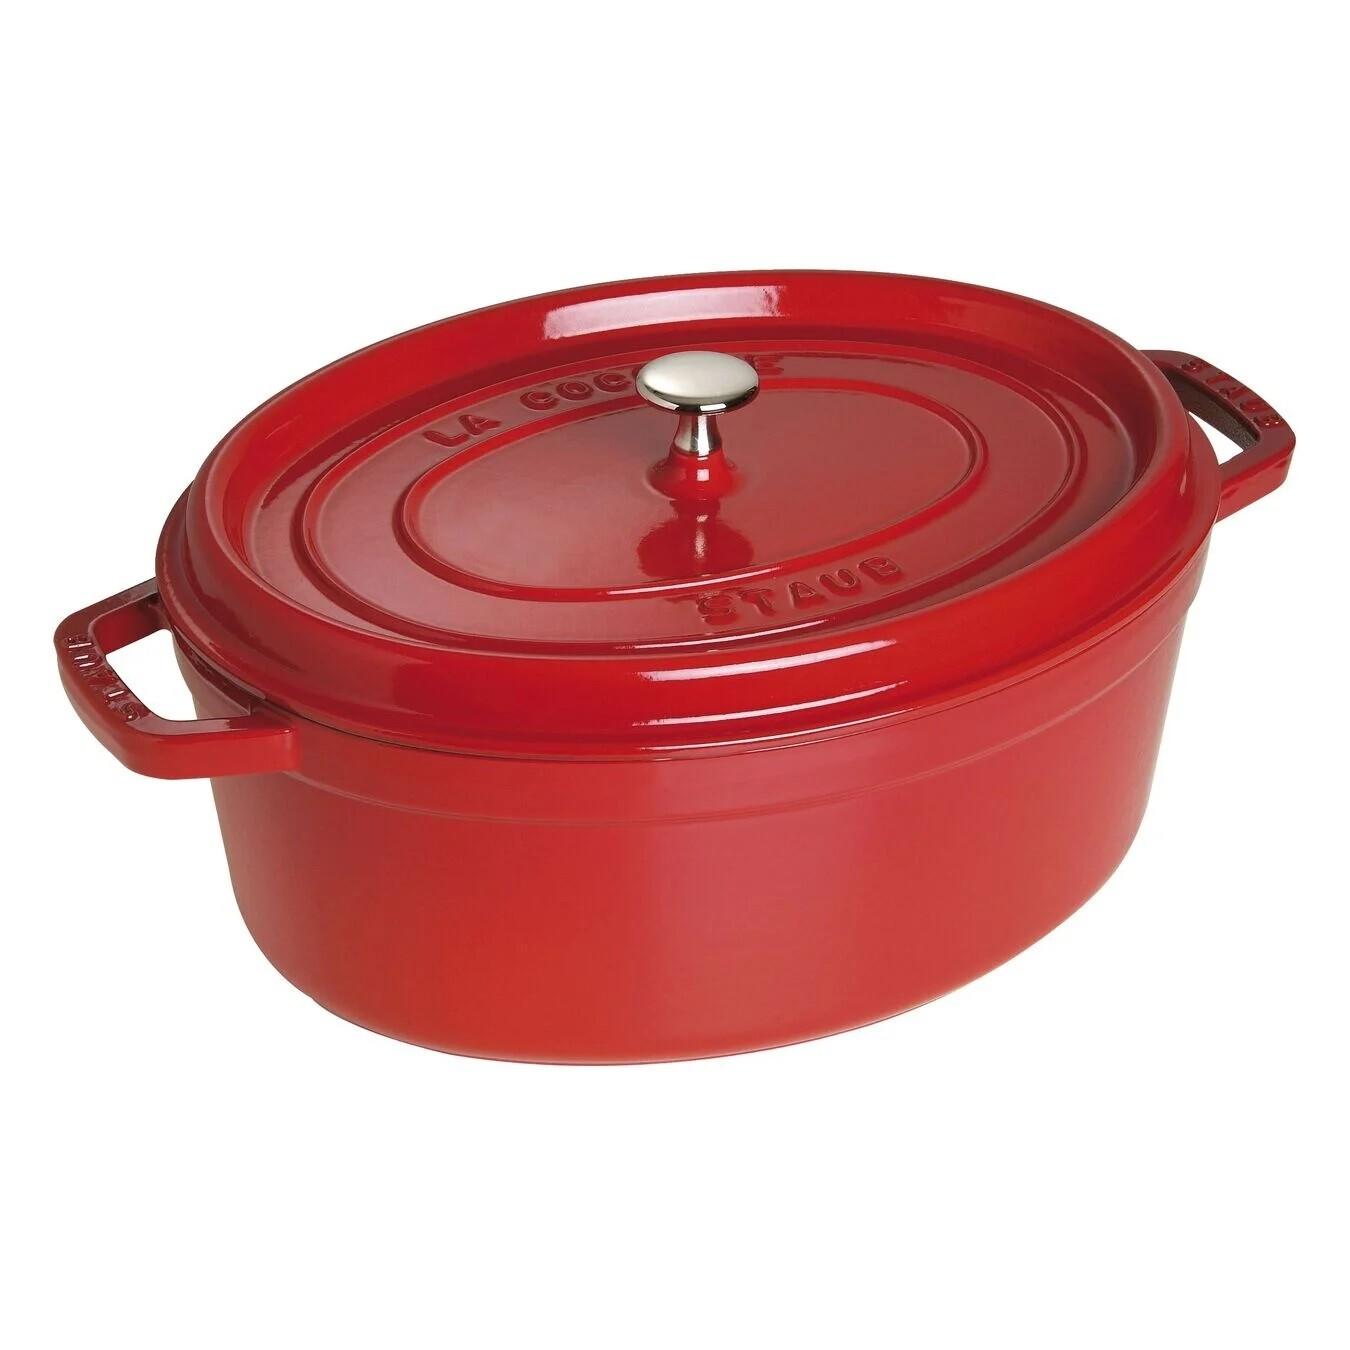 STAUB 'la cocotte' ovale stoofpot 37cm / 8,0L kersenrood  PROMO 339,00 -20%